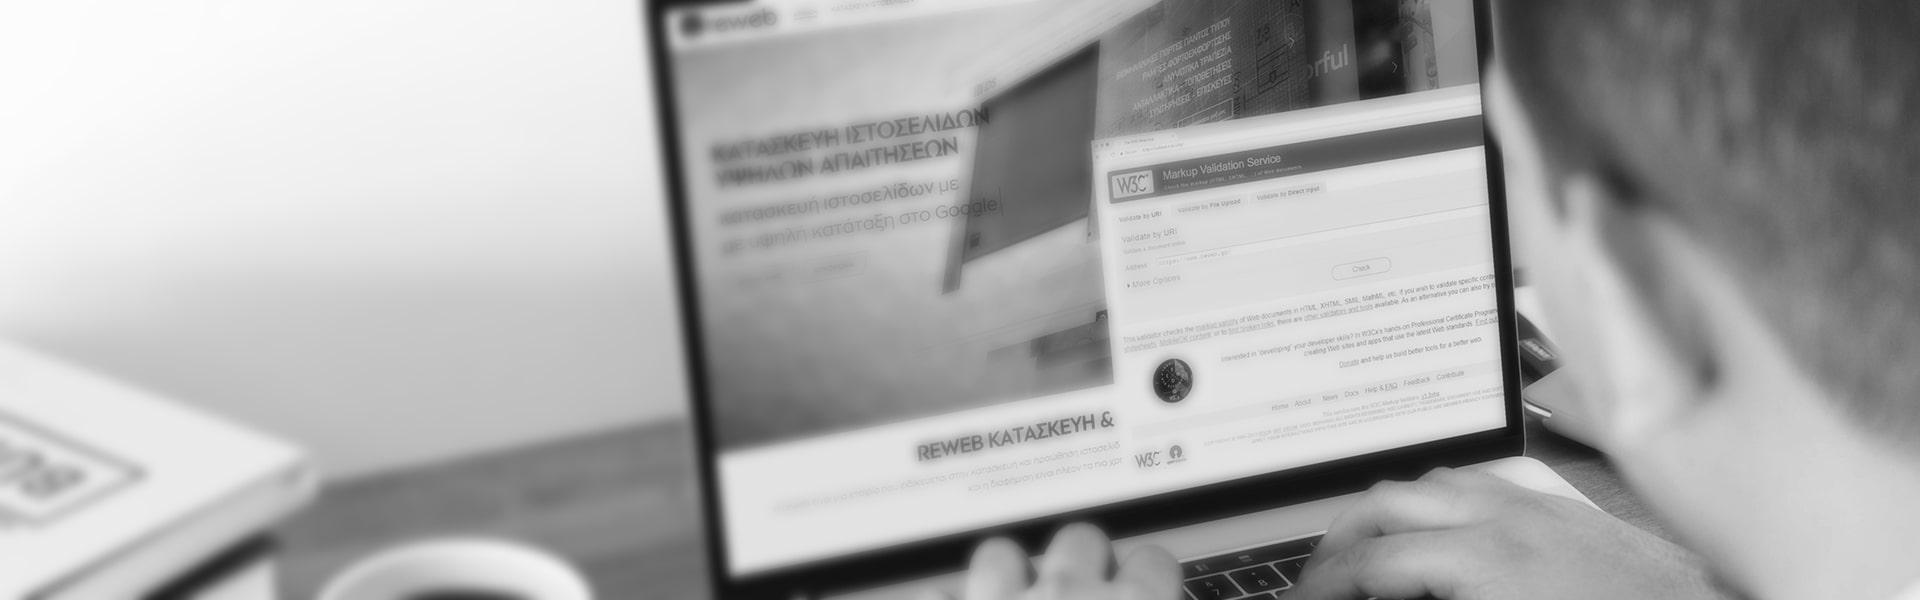 background μετατροπή ιστοσελίδας για ΑΜΕΑ